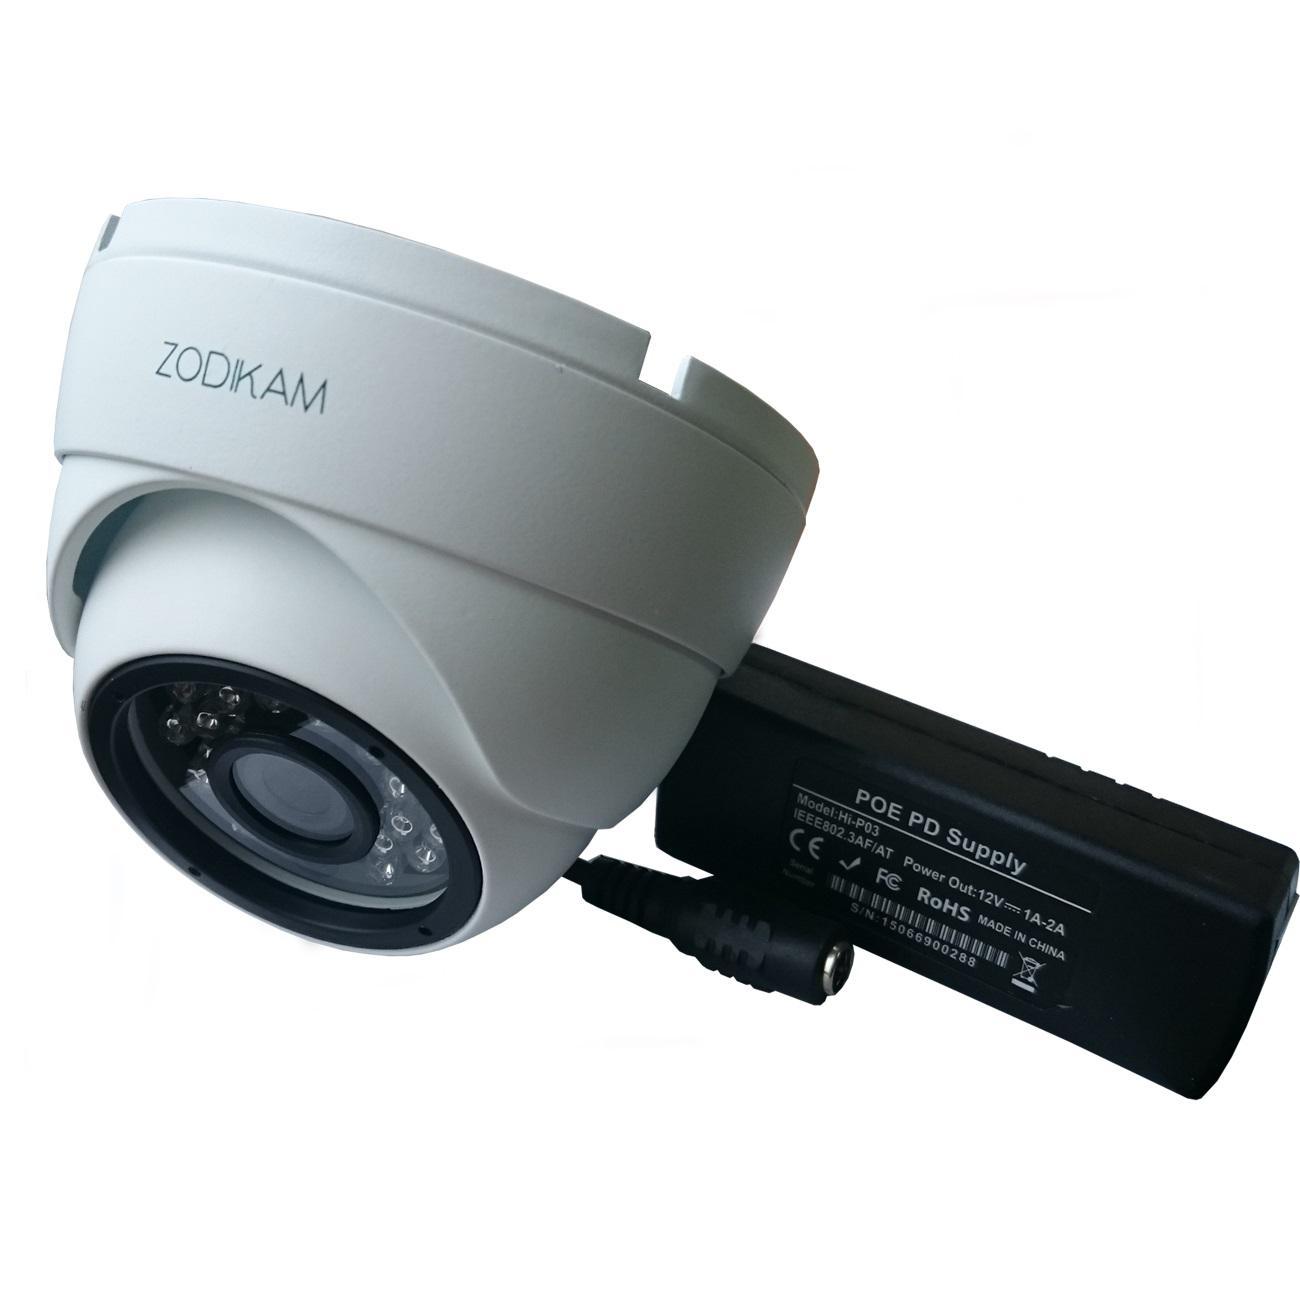 Камера видеонаблюдения Zodikam 3202-p 3.6